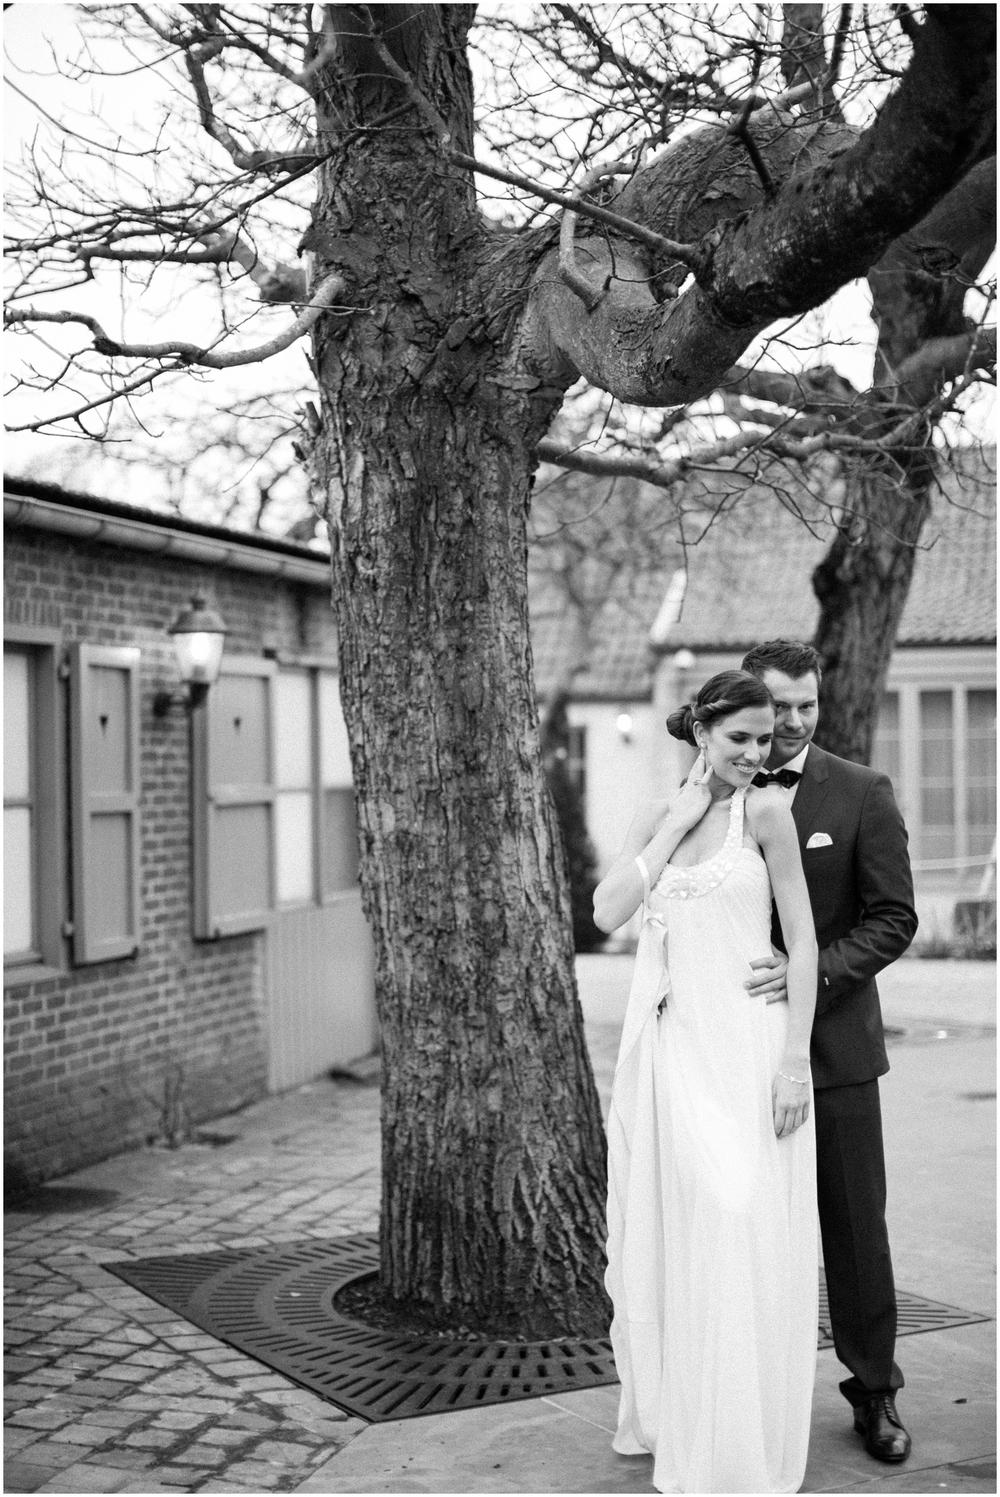 huwelijksfotograaf-merksem-E10-hoeve-011.jpg